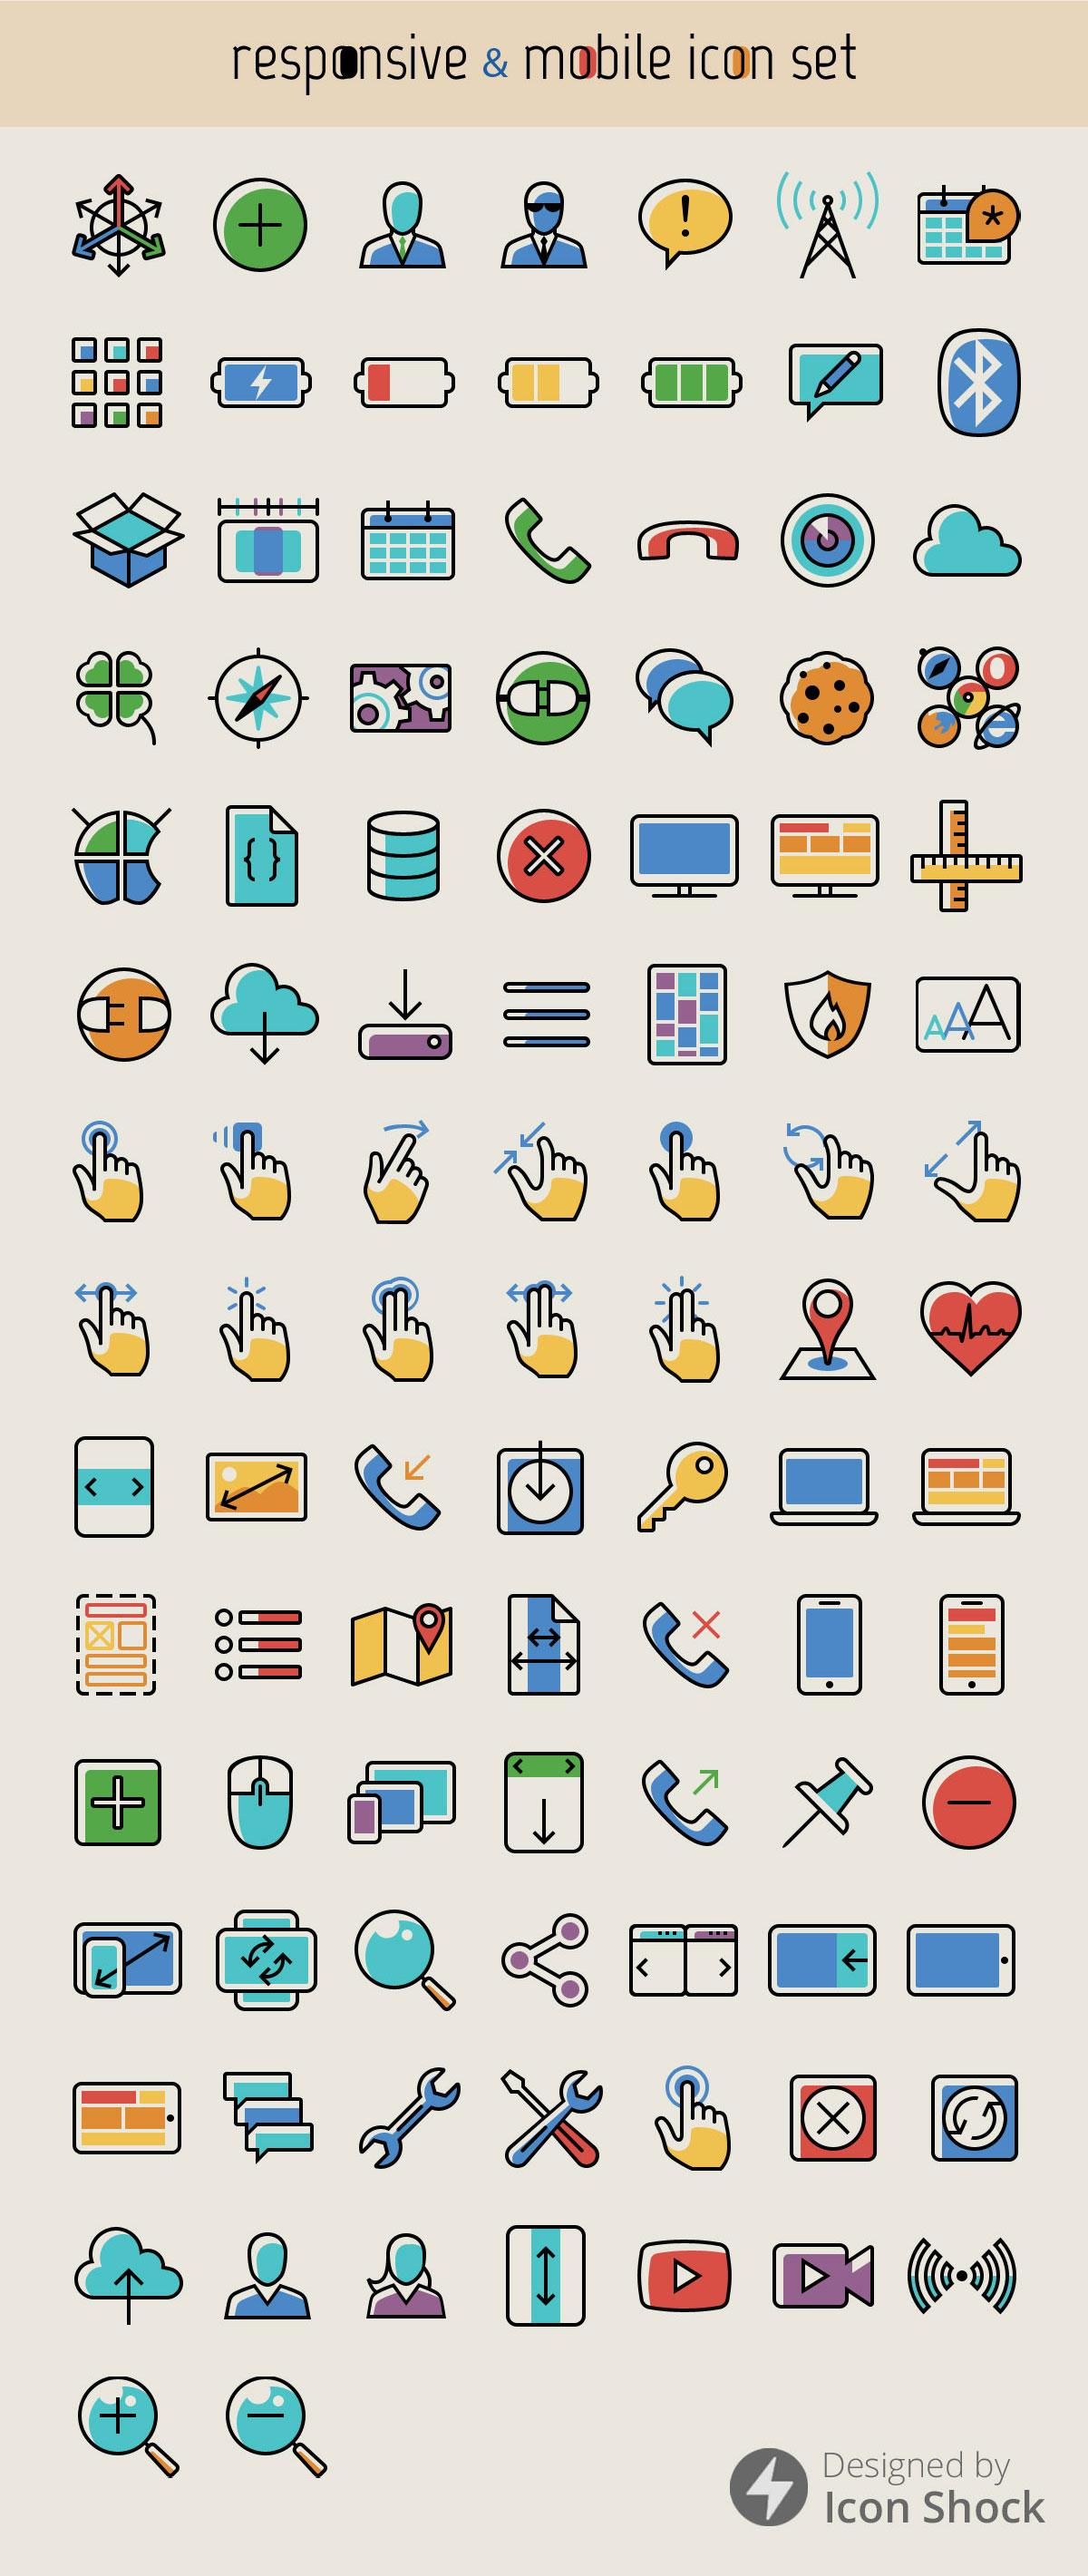 100-responsive-mobil-ikon-set-2